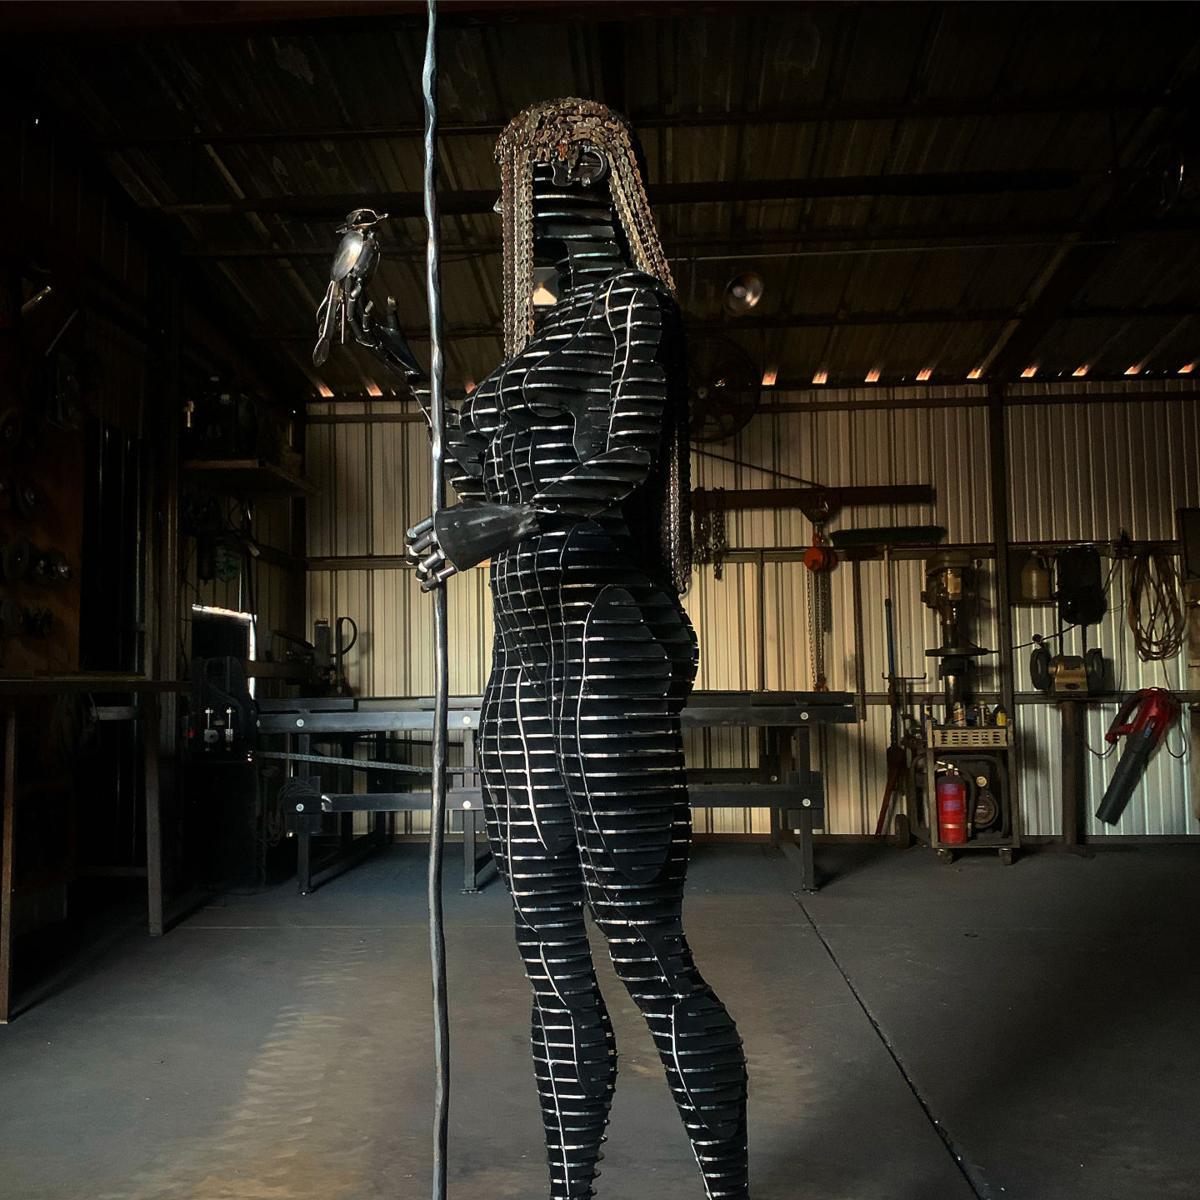 Stolen sculpture